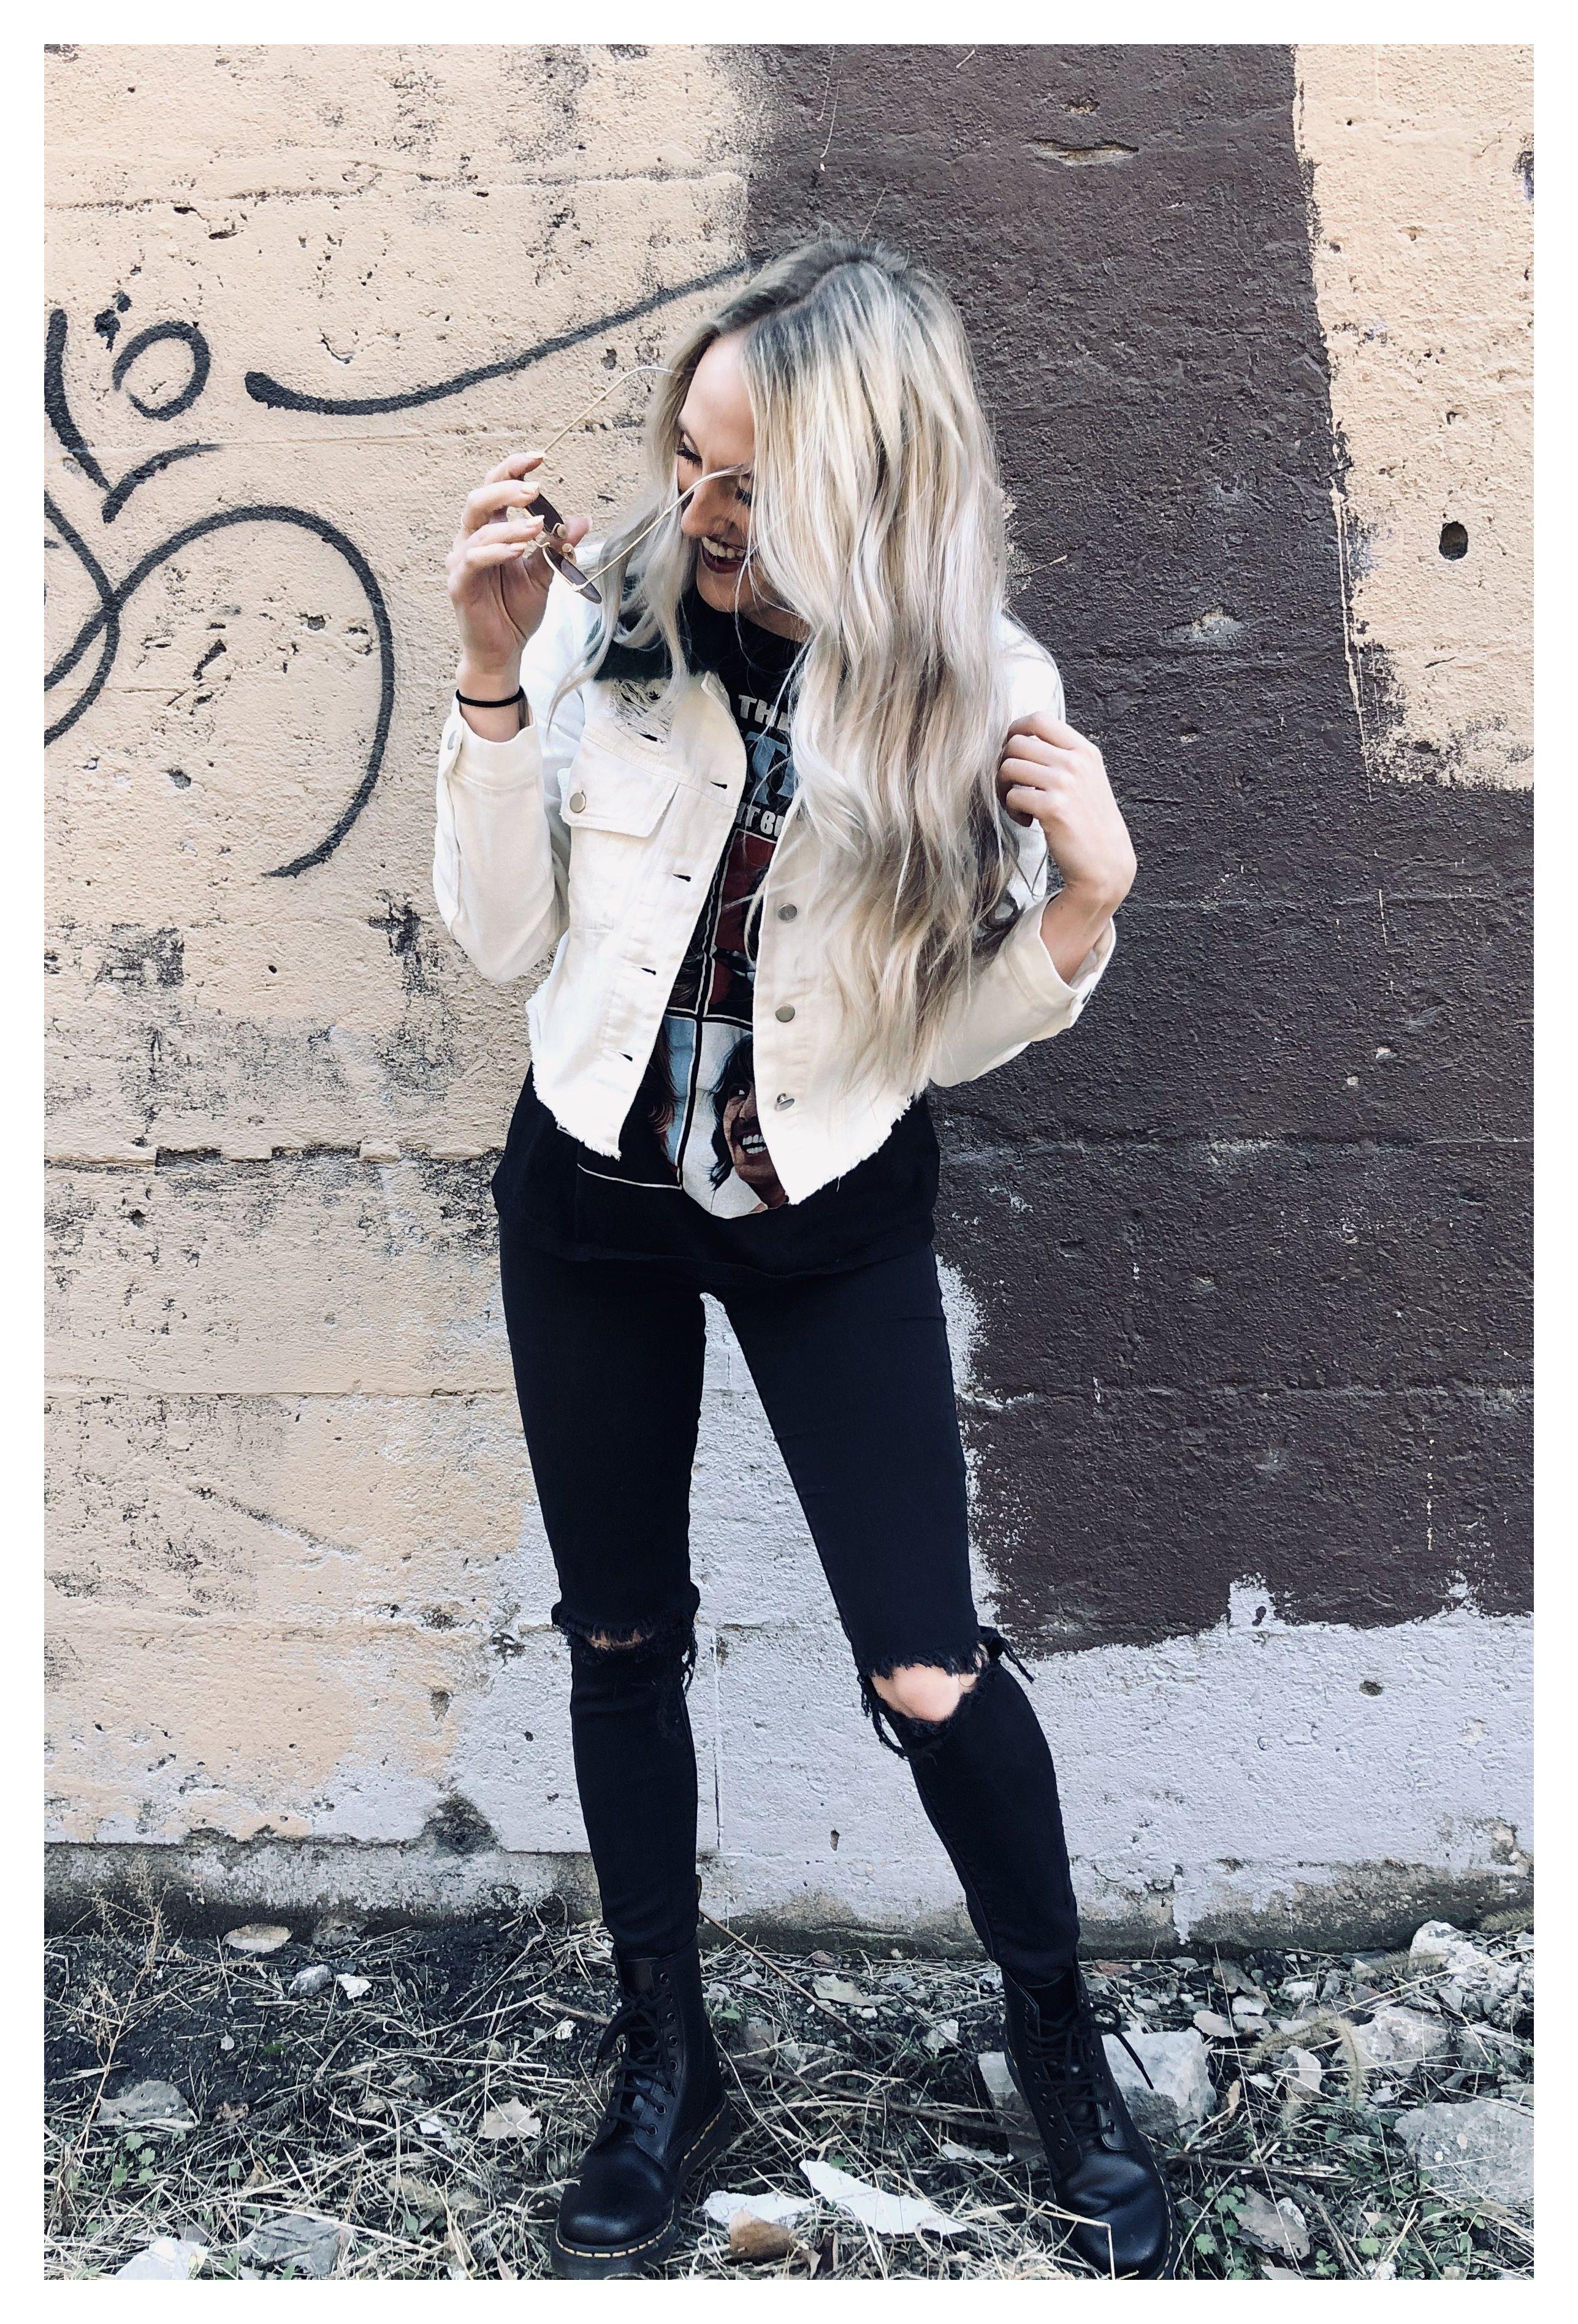 Denim Street White Denim Jacket Outfit Winter This Jacket Tho The White Albu White Denim Jacket Outfit White Jean Jacket Outfits White Denim Jacket [ 3791 x 2574 Pixel ]